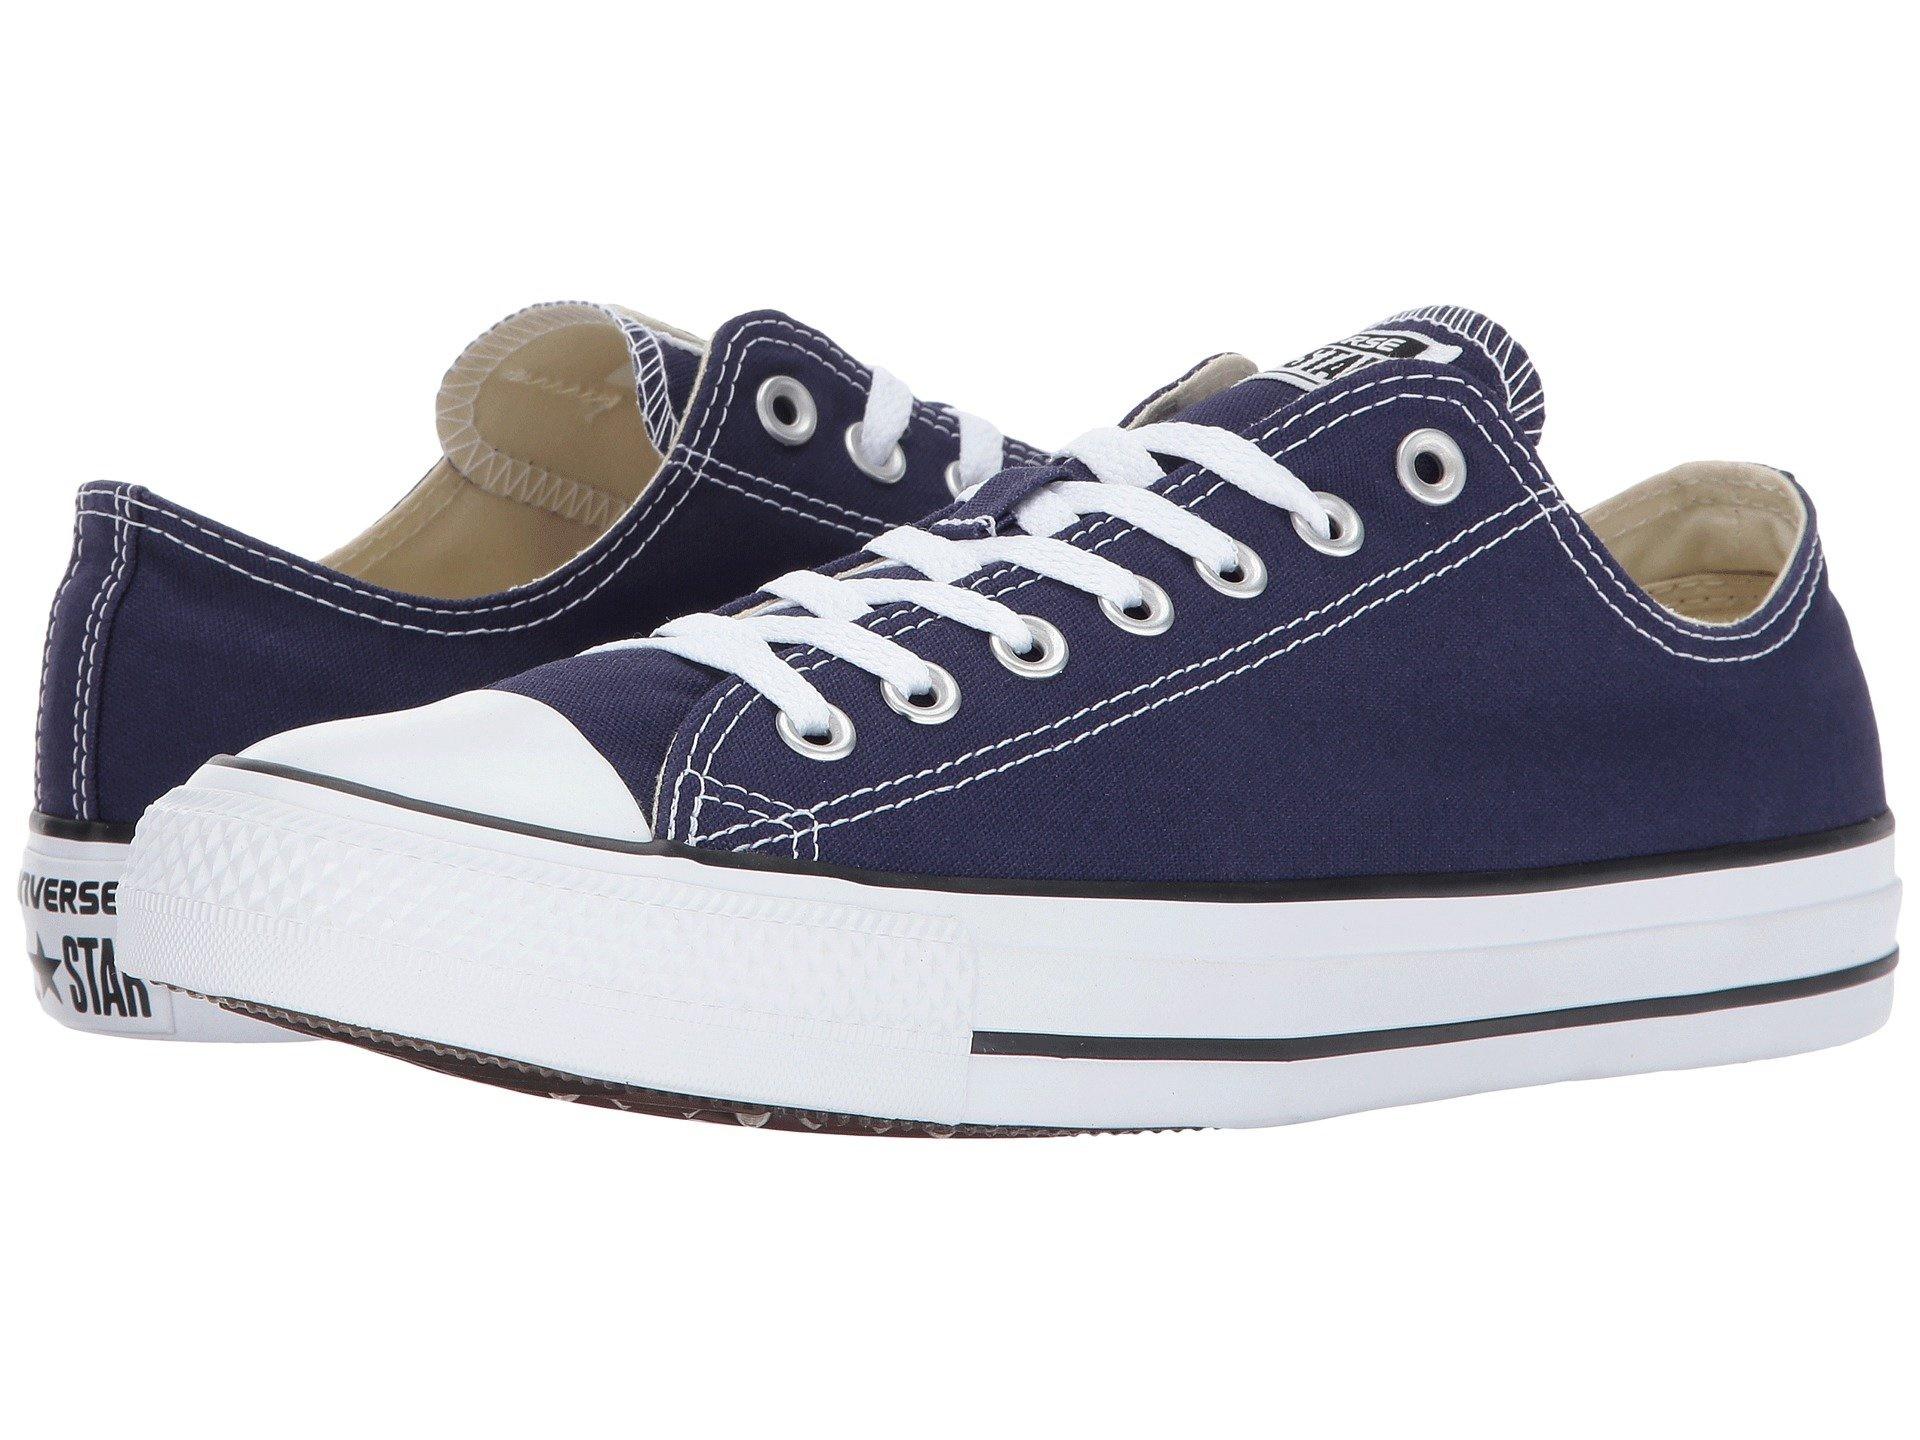 31e249aef376 Qoo10 - Converse Chuck Taylor All Star Seasonal Ox   Bags Shoes ...